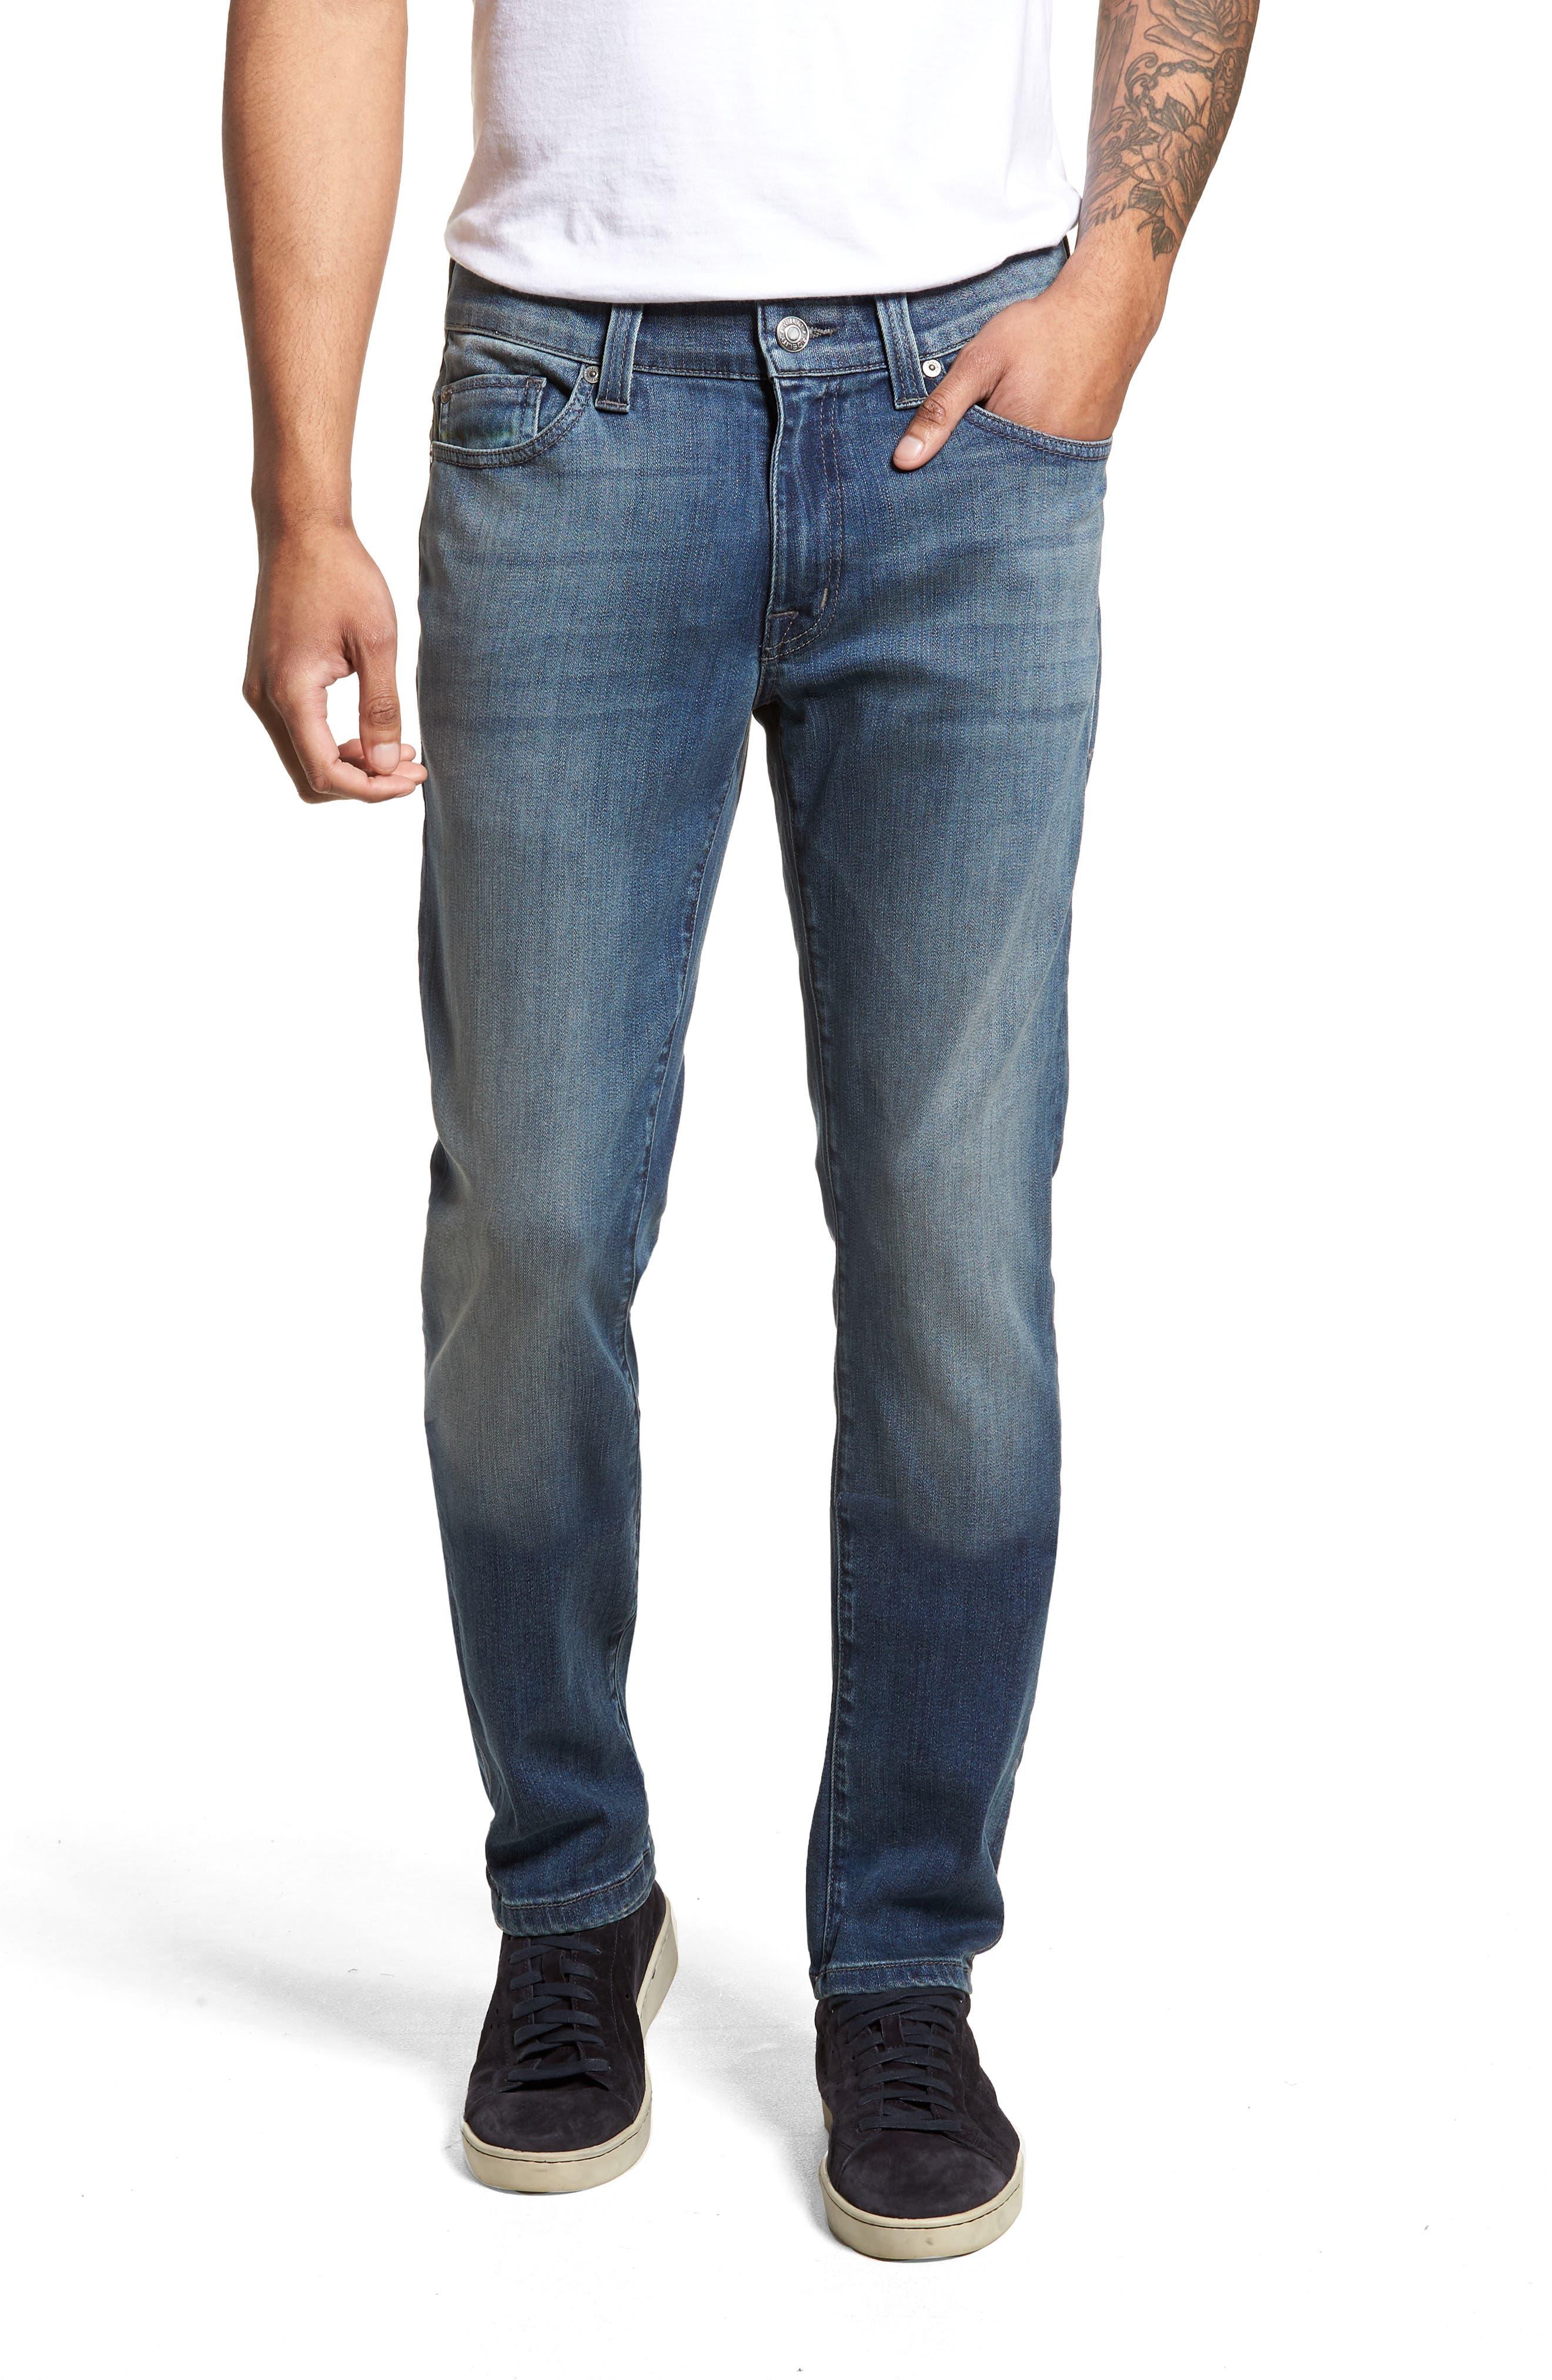 Torino Slim Fit Jeans,                         Main,                         color, Atlas Blue